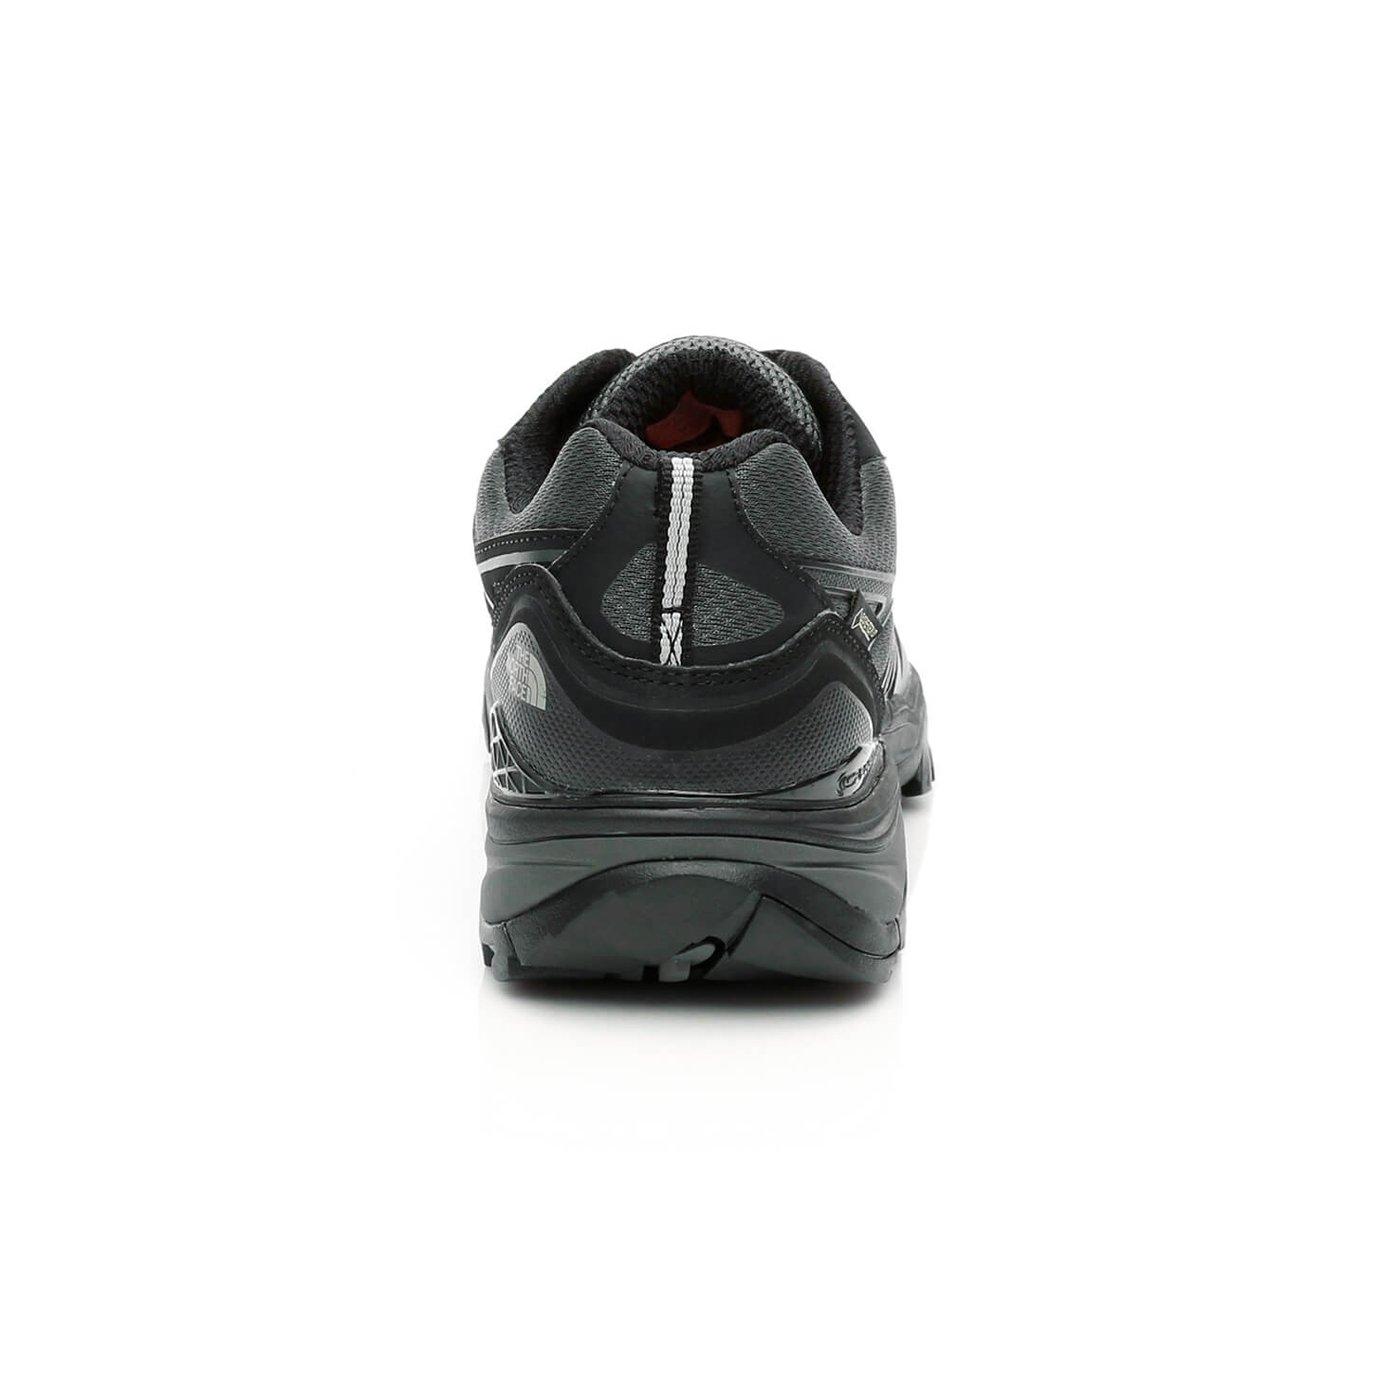 The North Face Hedgehog Fastpack GTX Erkek Siyah Spor Ayakkabı